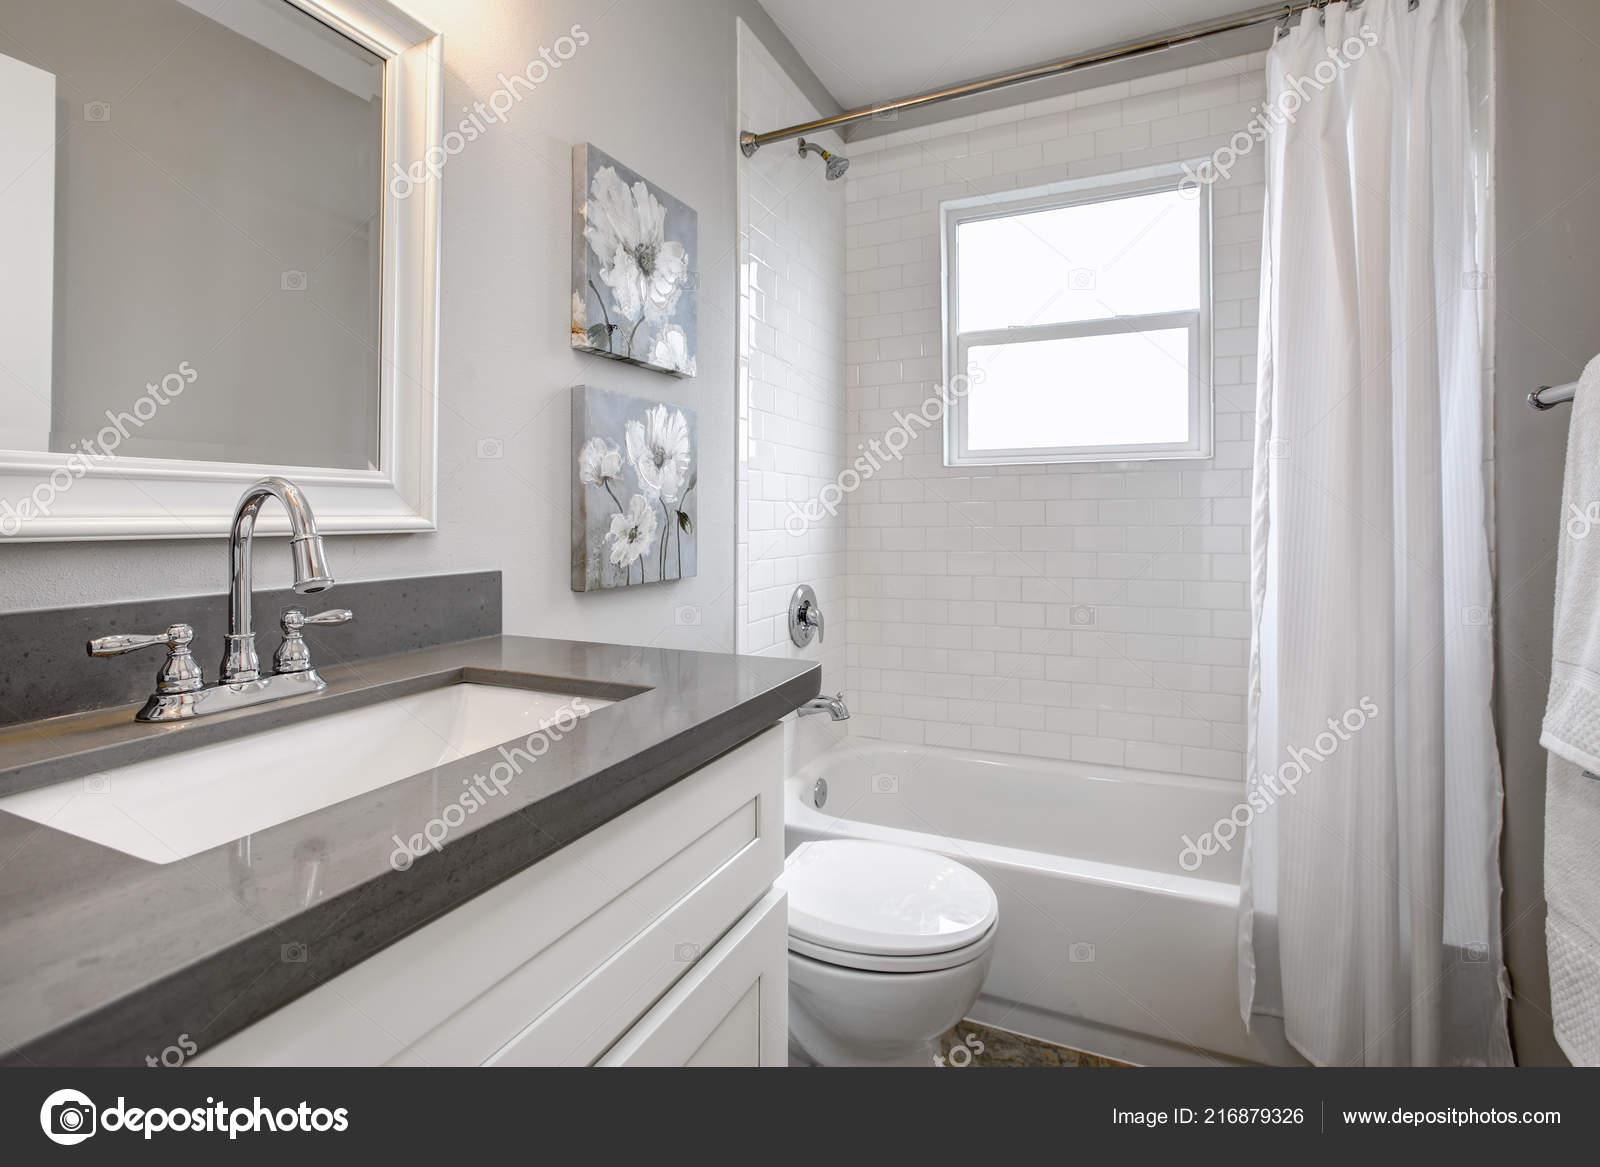 Modern Bathroom Interior White Vanity Topped Gray Countertop Stock Photo C Iriana88w 216879326